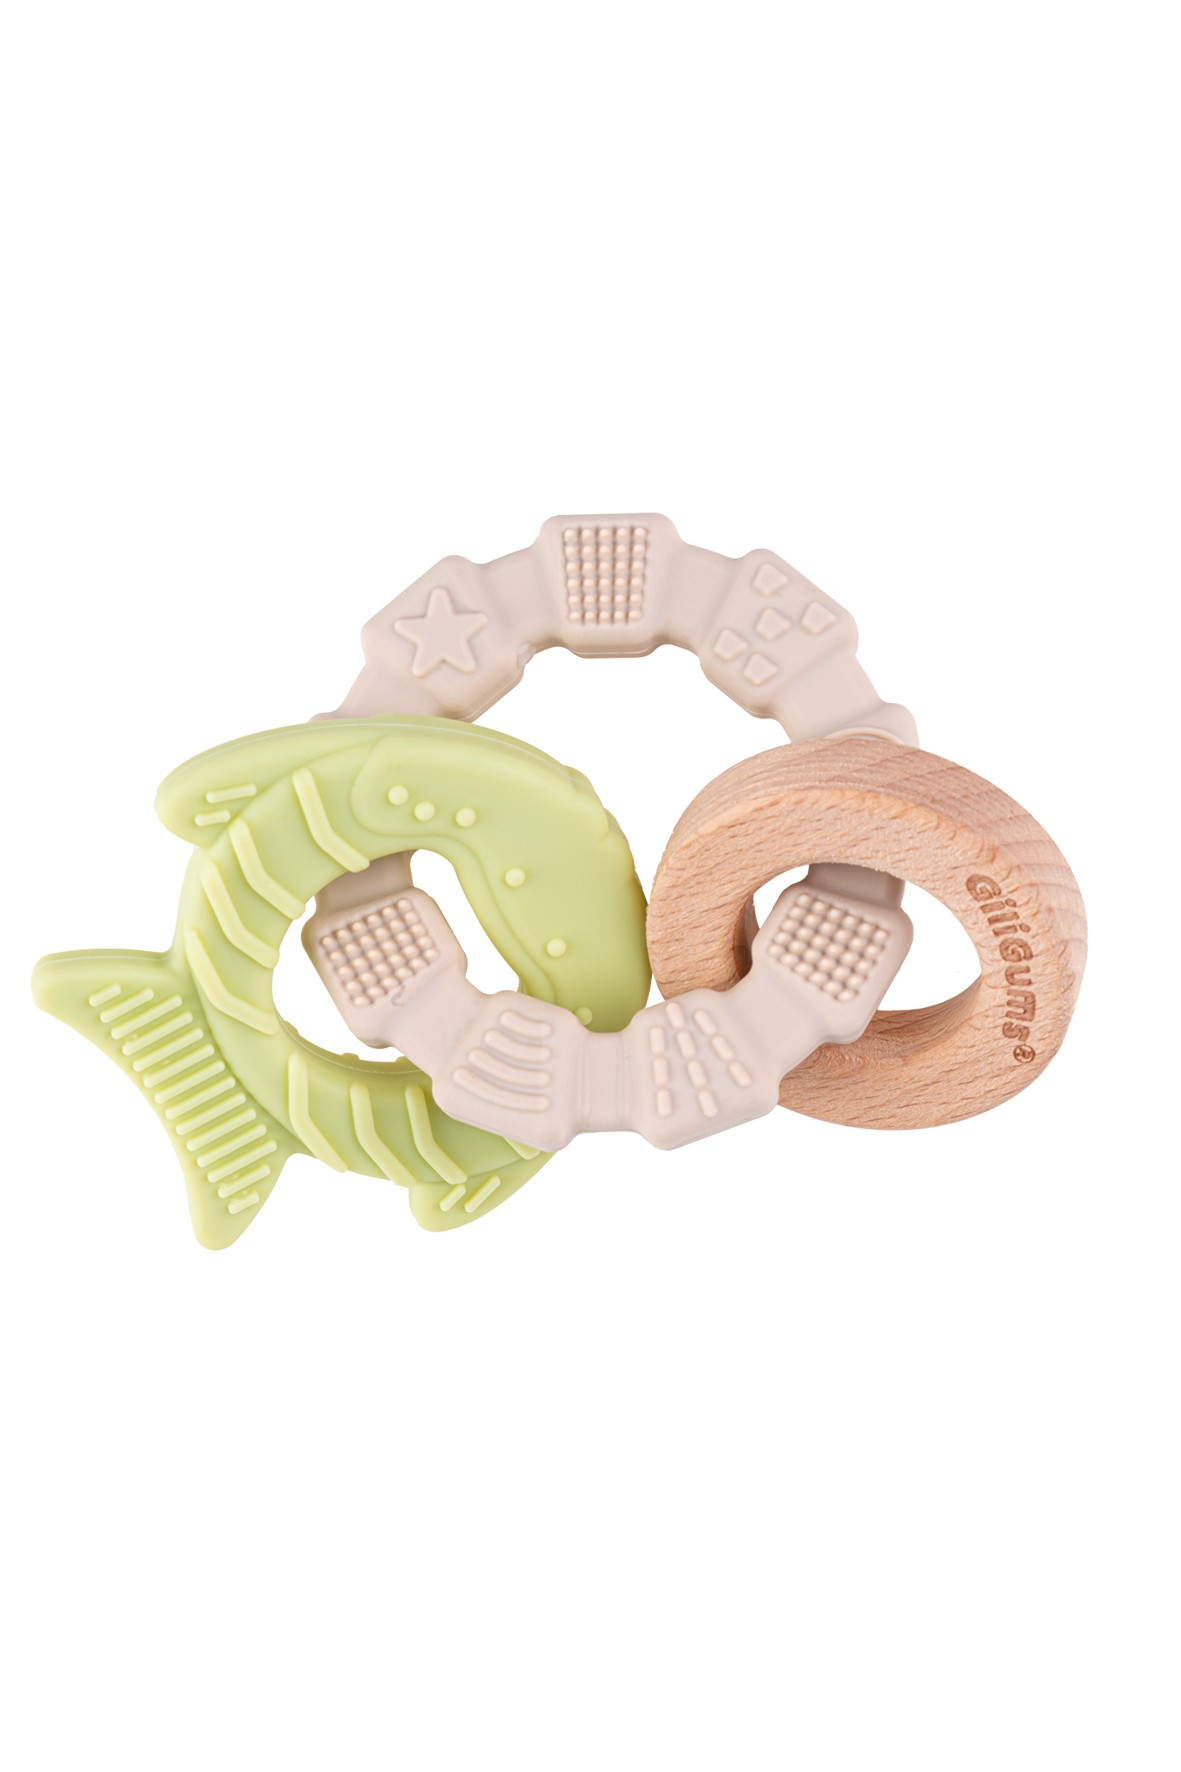 Silikonowy gryzak rybka GiliGums